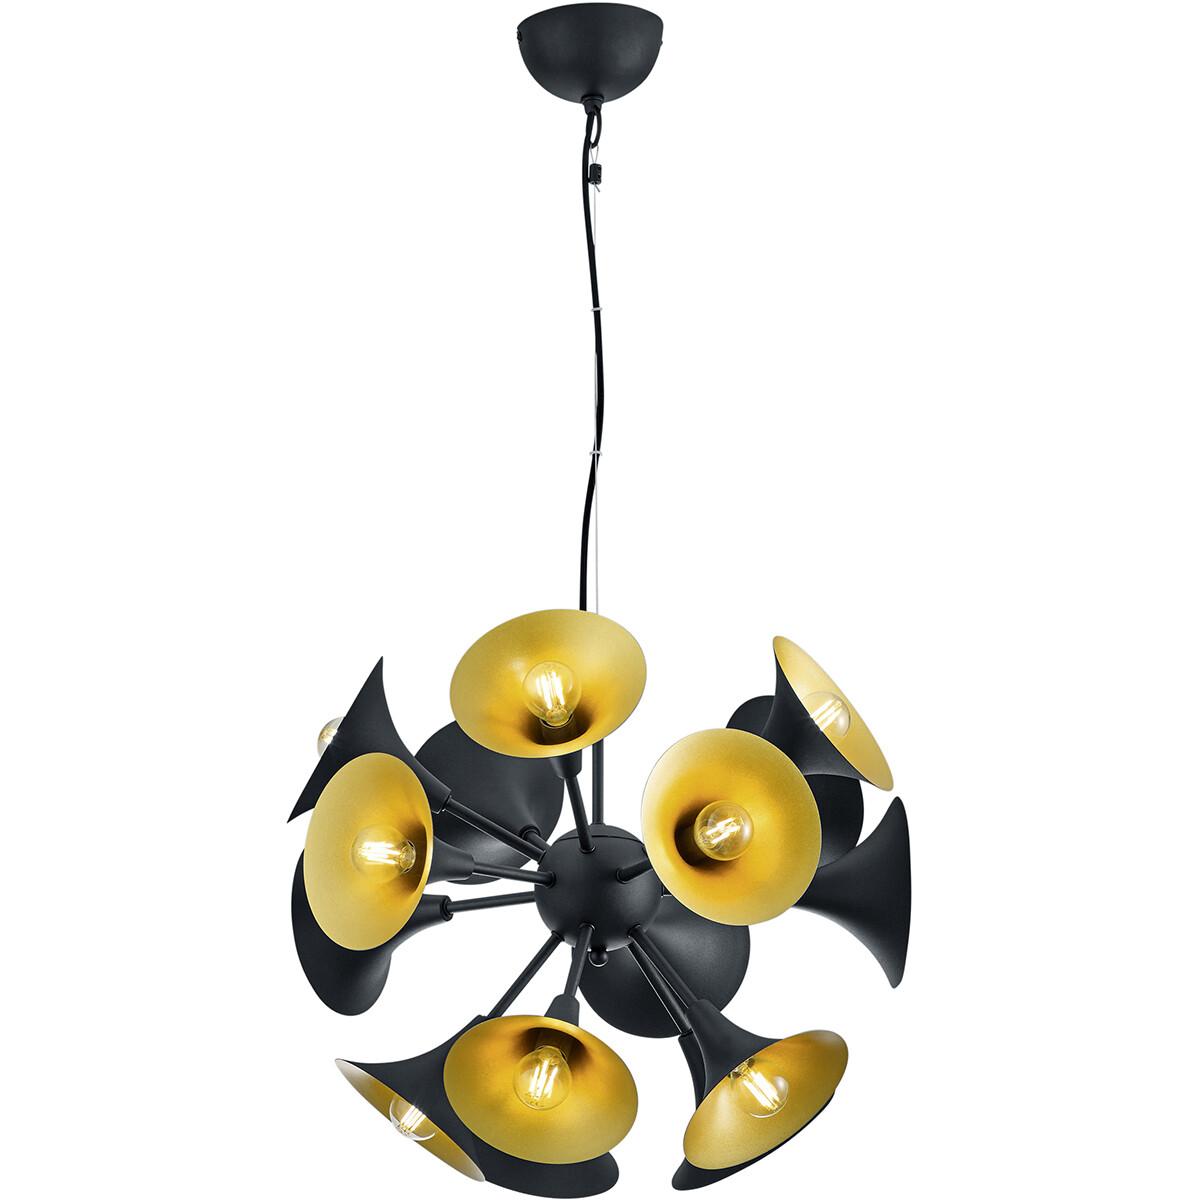 LED Hanglamp - Hangverlichting - Trion Mackon - E14 Fitting - Rond - Mat Zwart - Aluminium